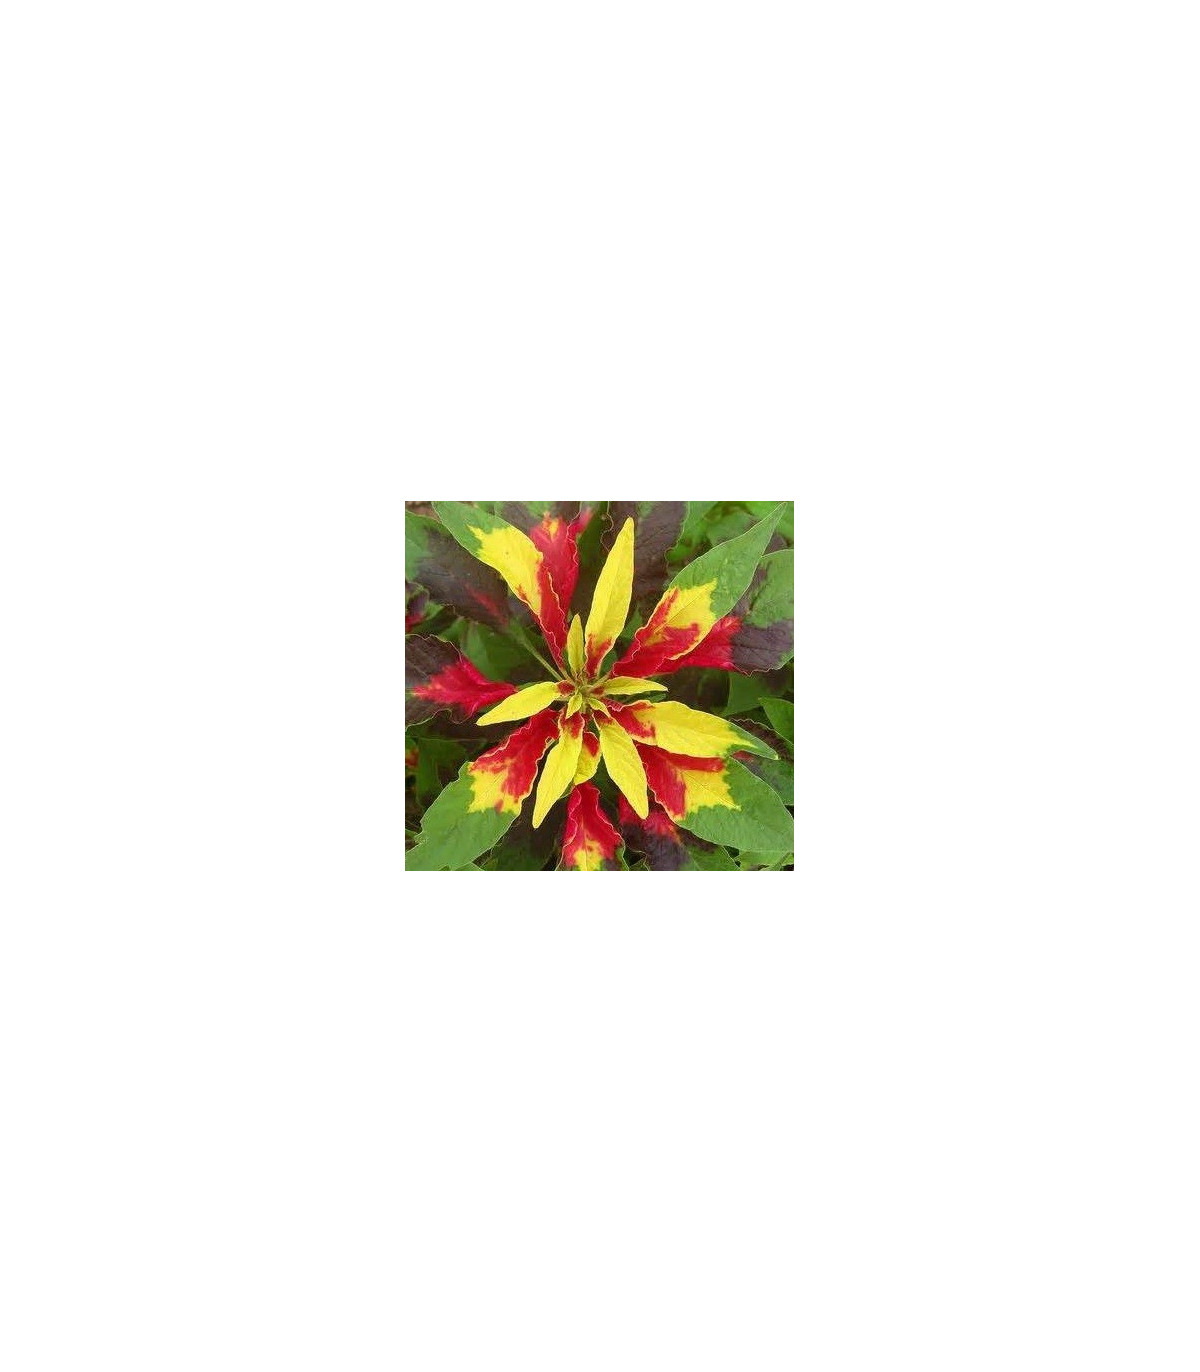 Láskavec trojfarebný - Amaranthus tricolor - semená láskavca - semiačka - 0,2 gr